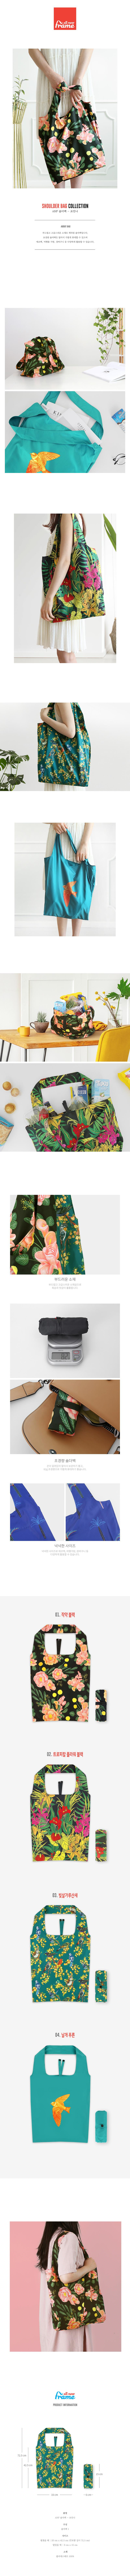 ANF 숄더백 - 요안나 - 올뉴프레임, 18,000원, 캔버스/에코백, 에코백